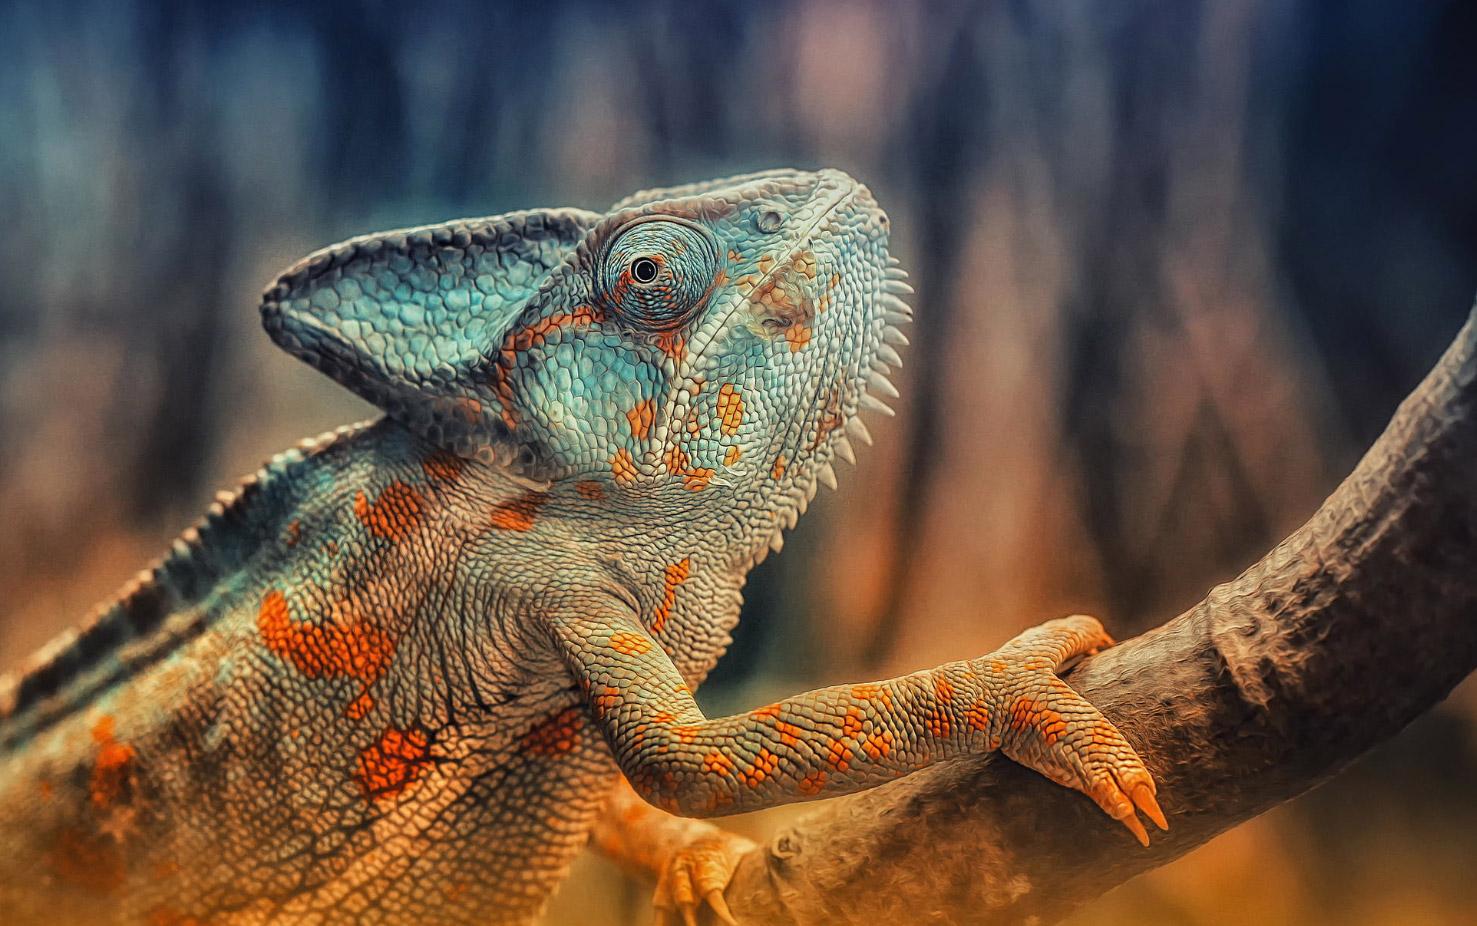 reptiles-amphibians-detlef-knapp-05